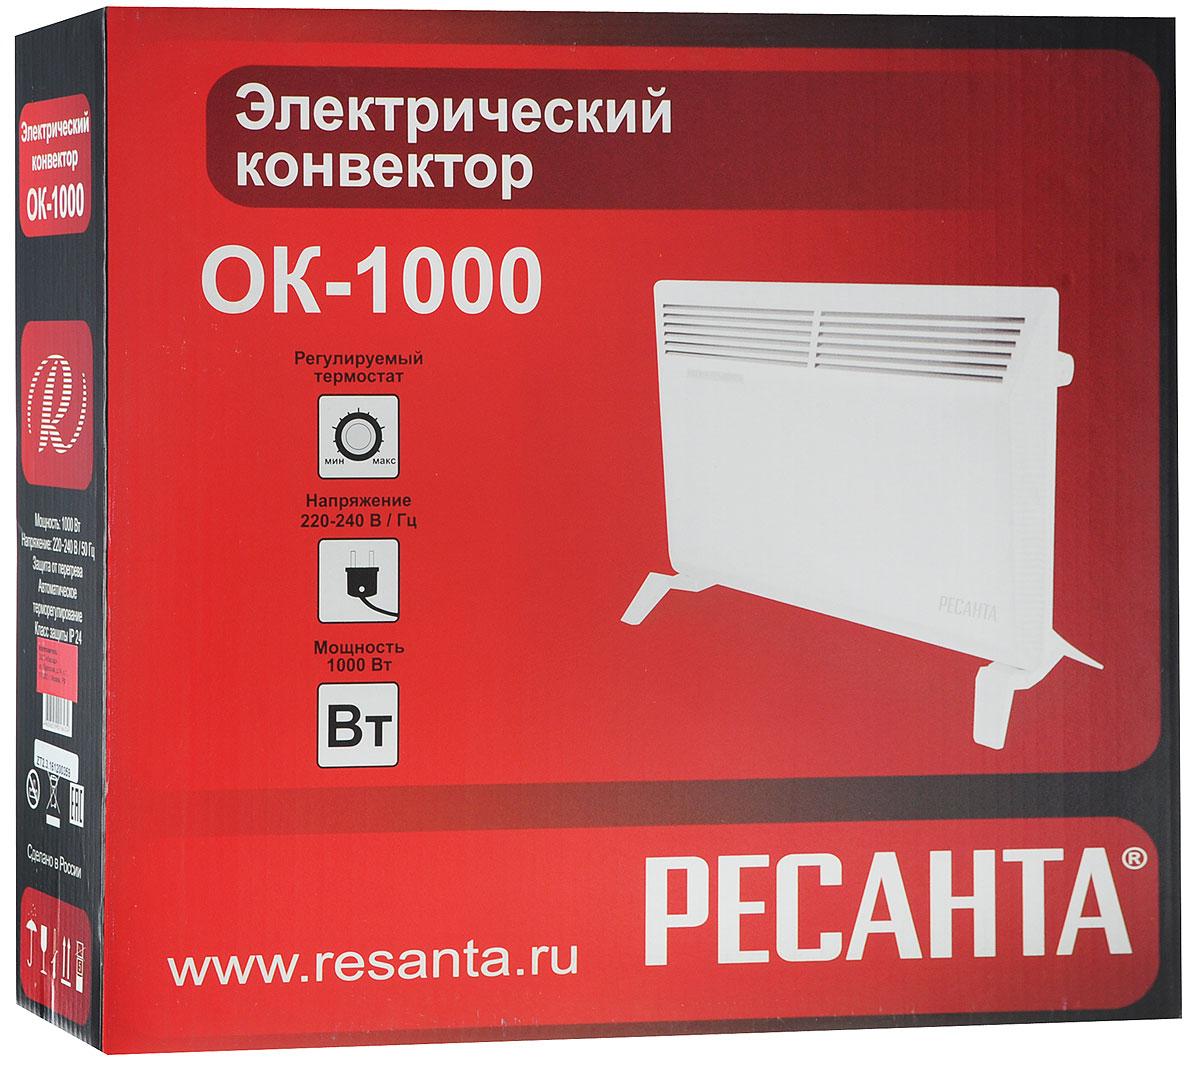 Ресанта ОК-1000 конвектор